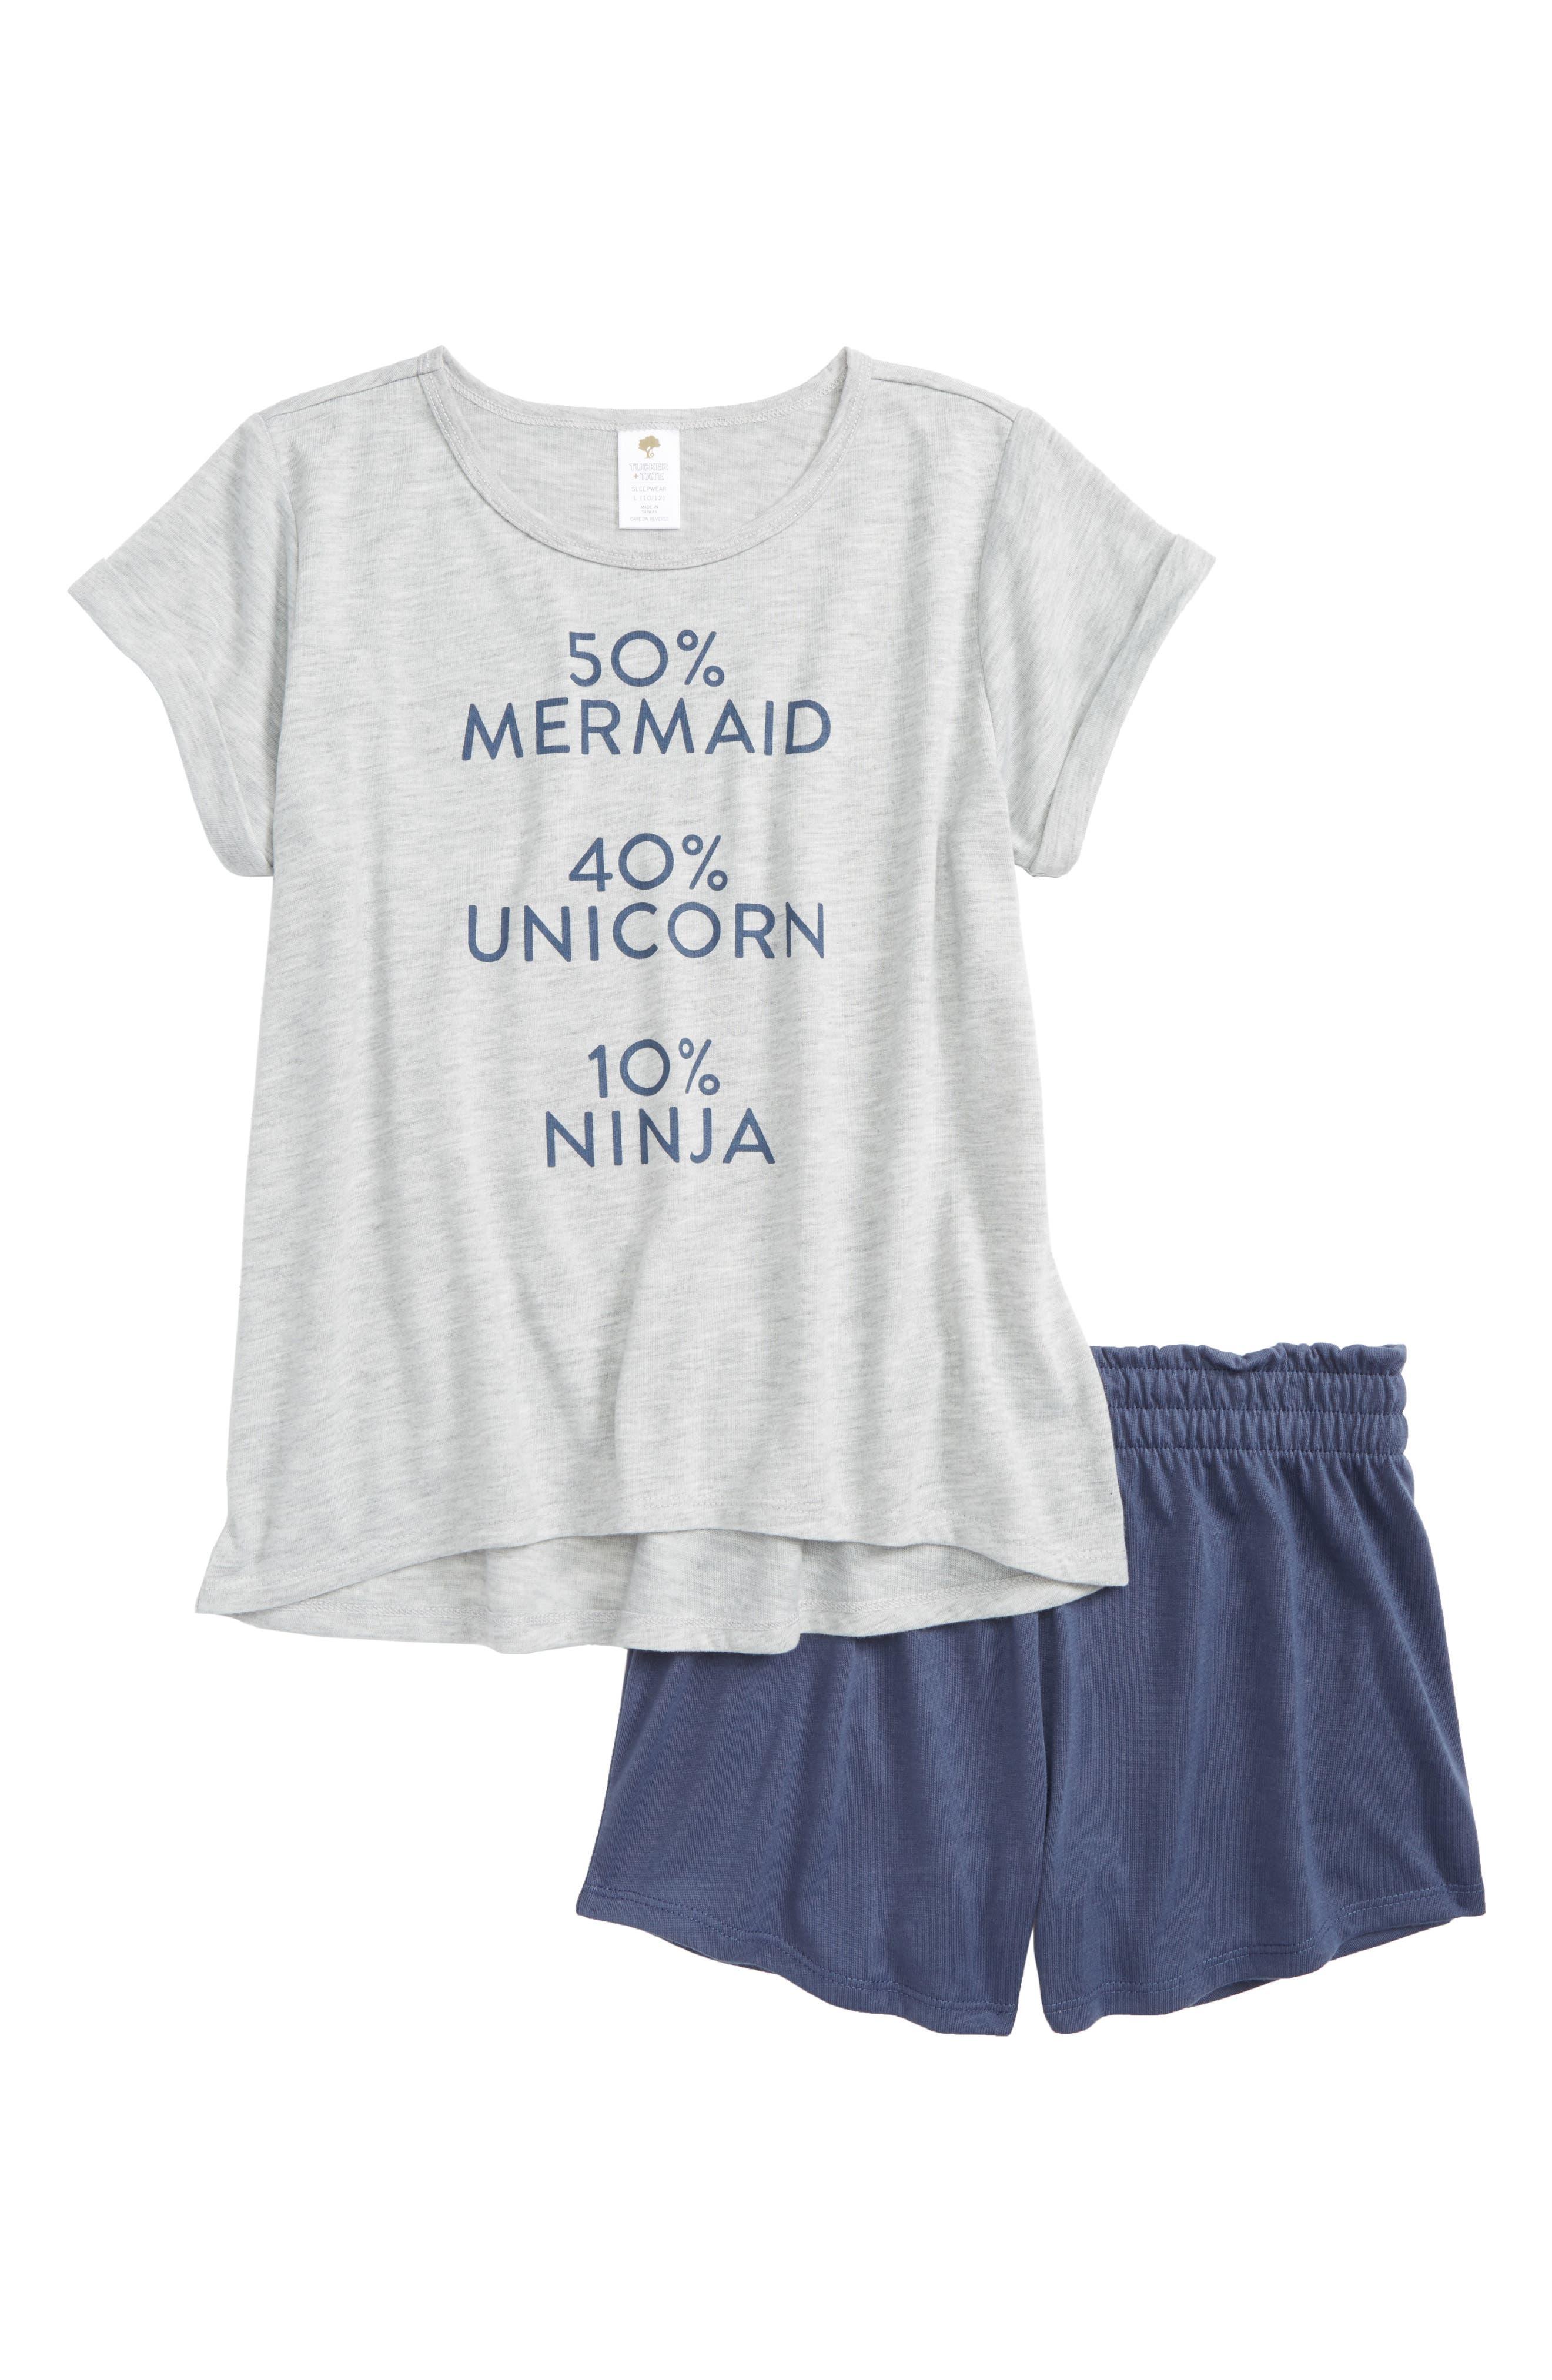 Short Pajamas,                         Main,                         color, Grey Ash Heather Ninja